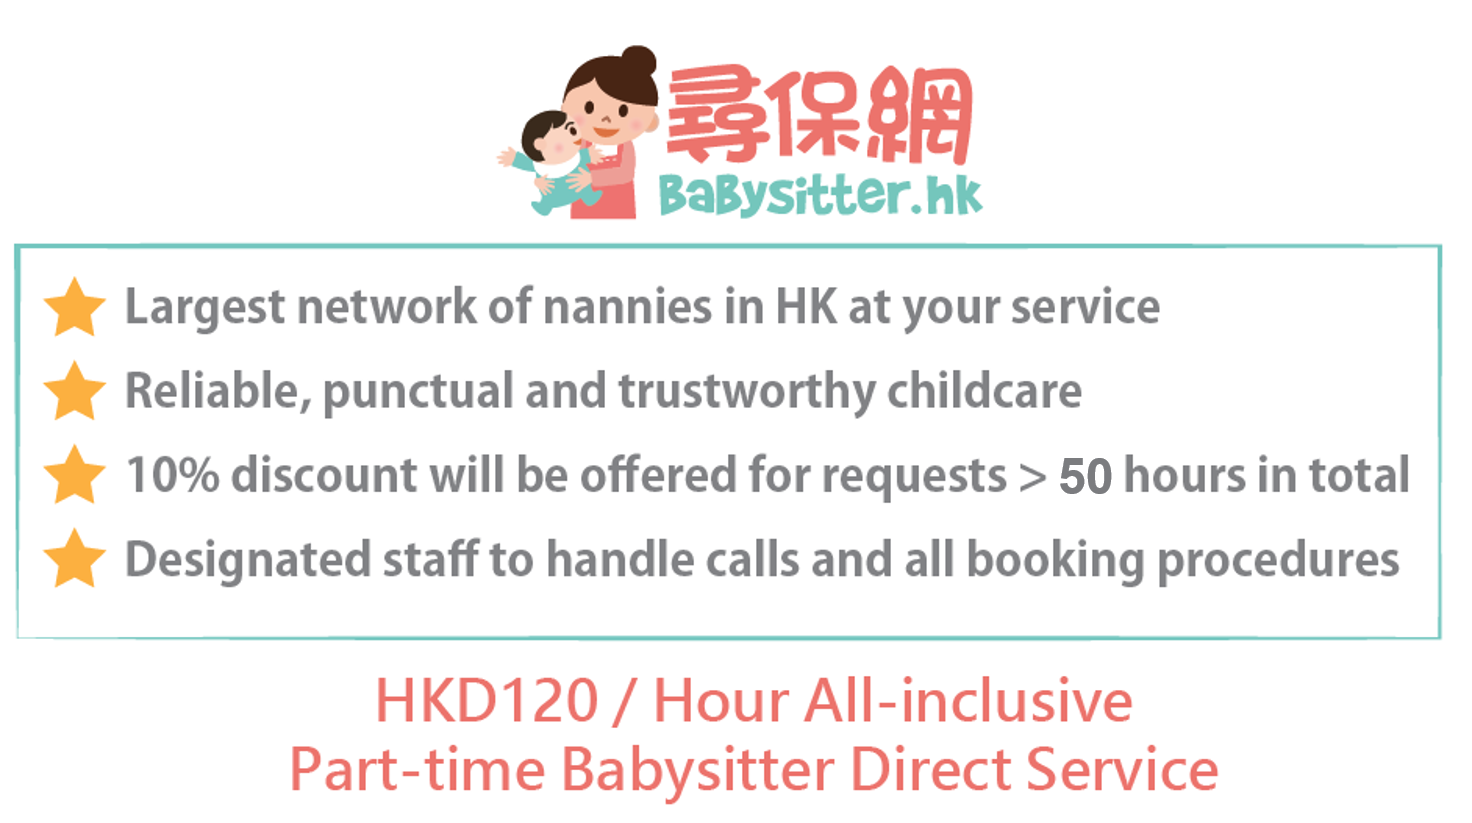 Part-time Babysitter Direct Service | Babysitter.hk - Hong Kong's ...